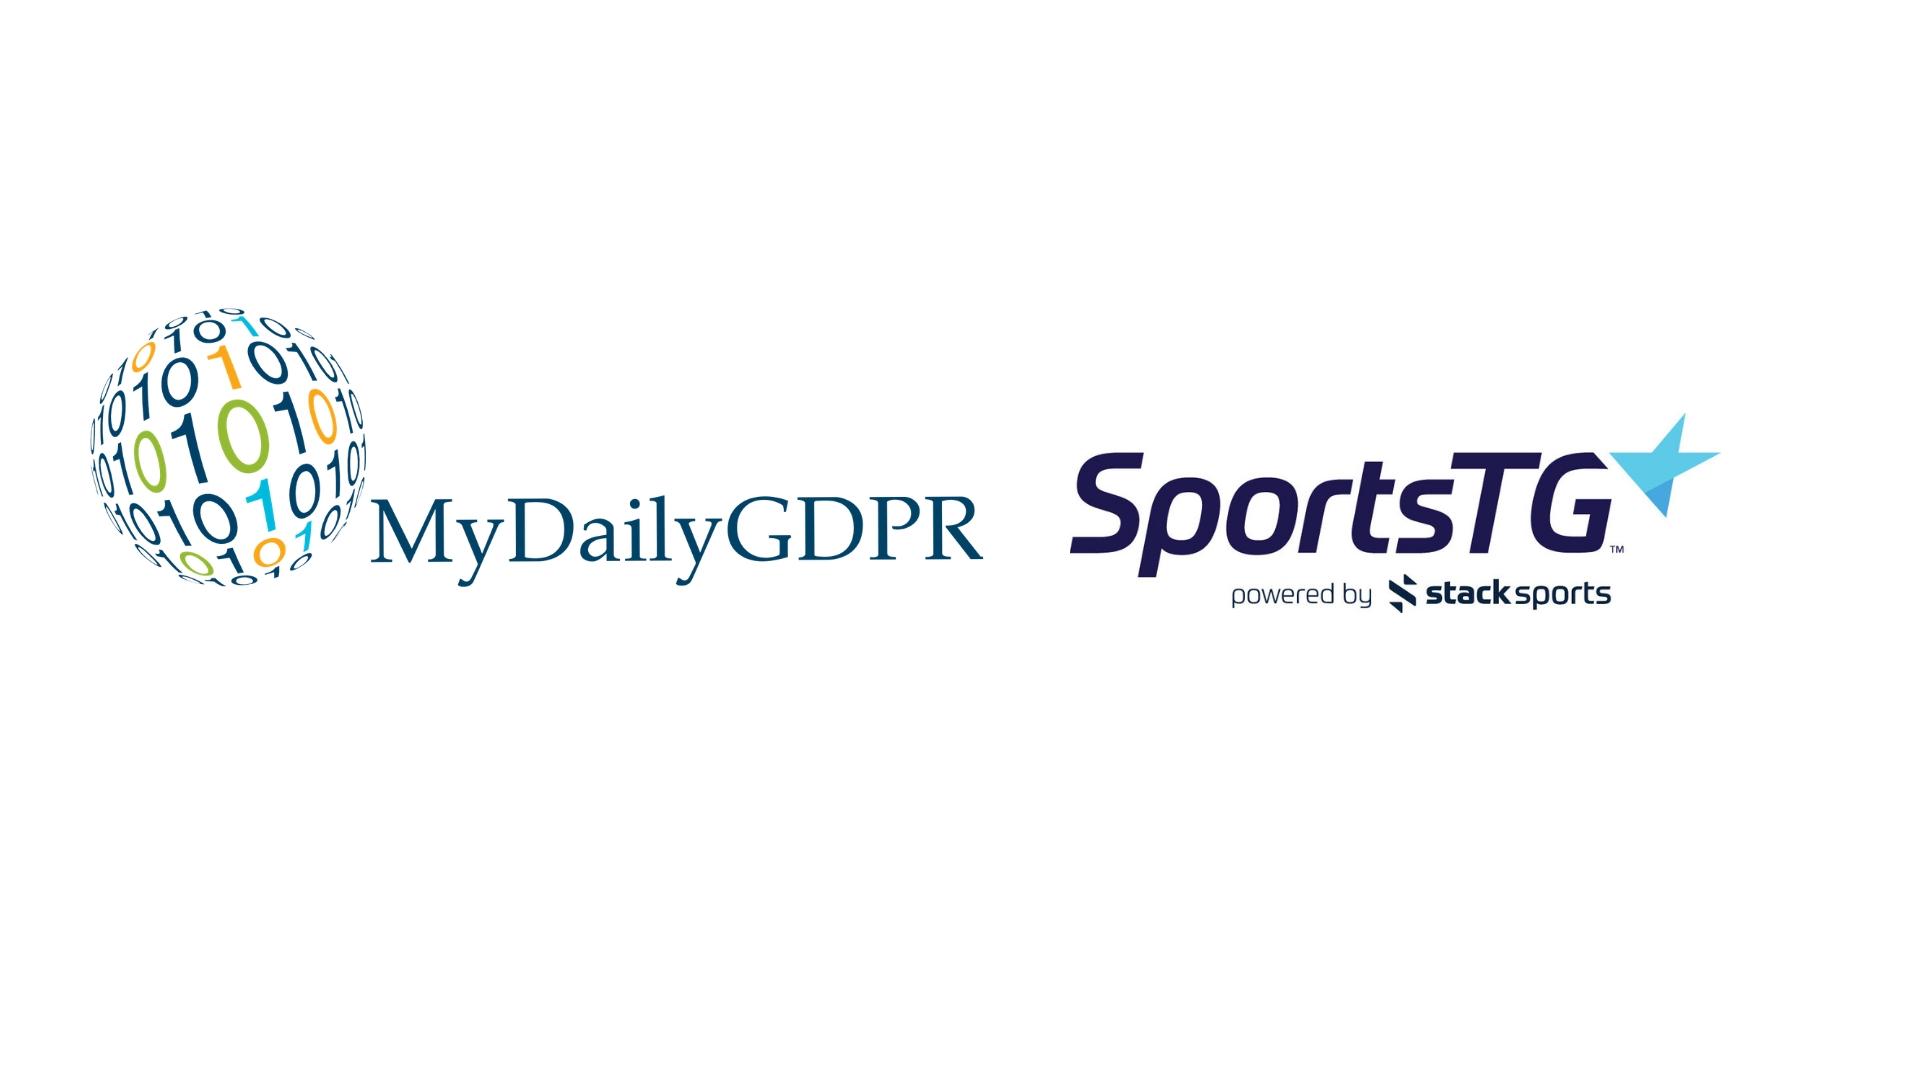 MyDailyGDPR and SportsTG logos